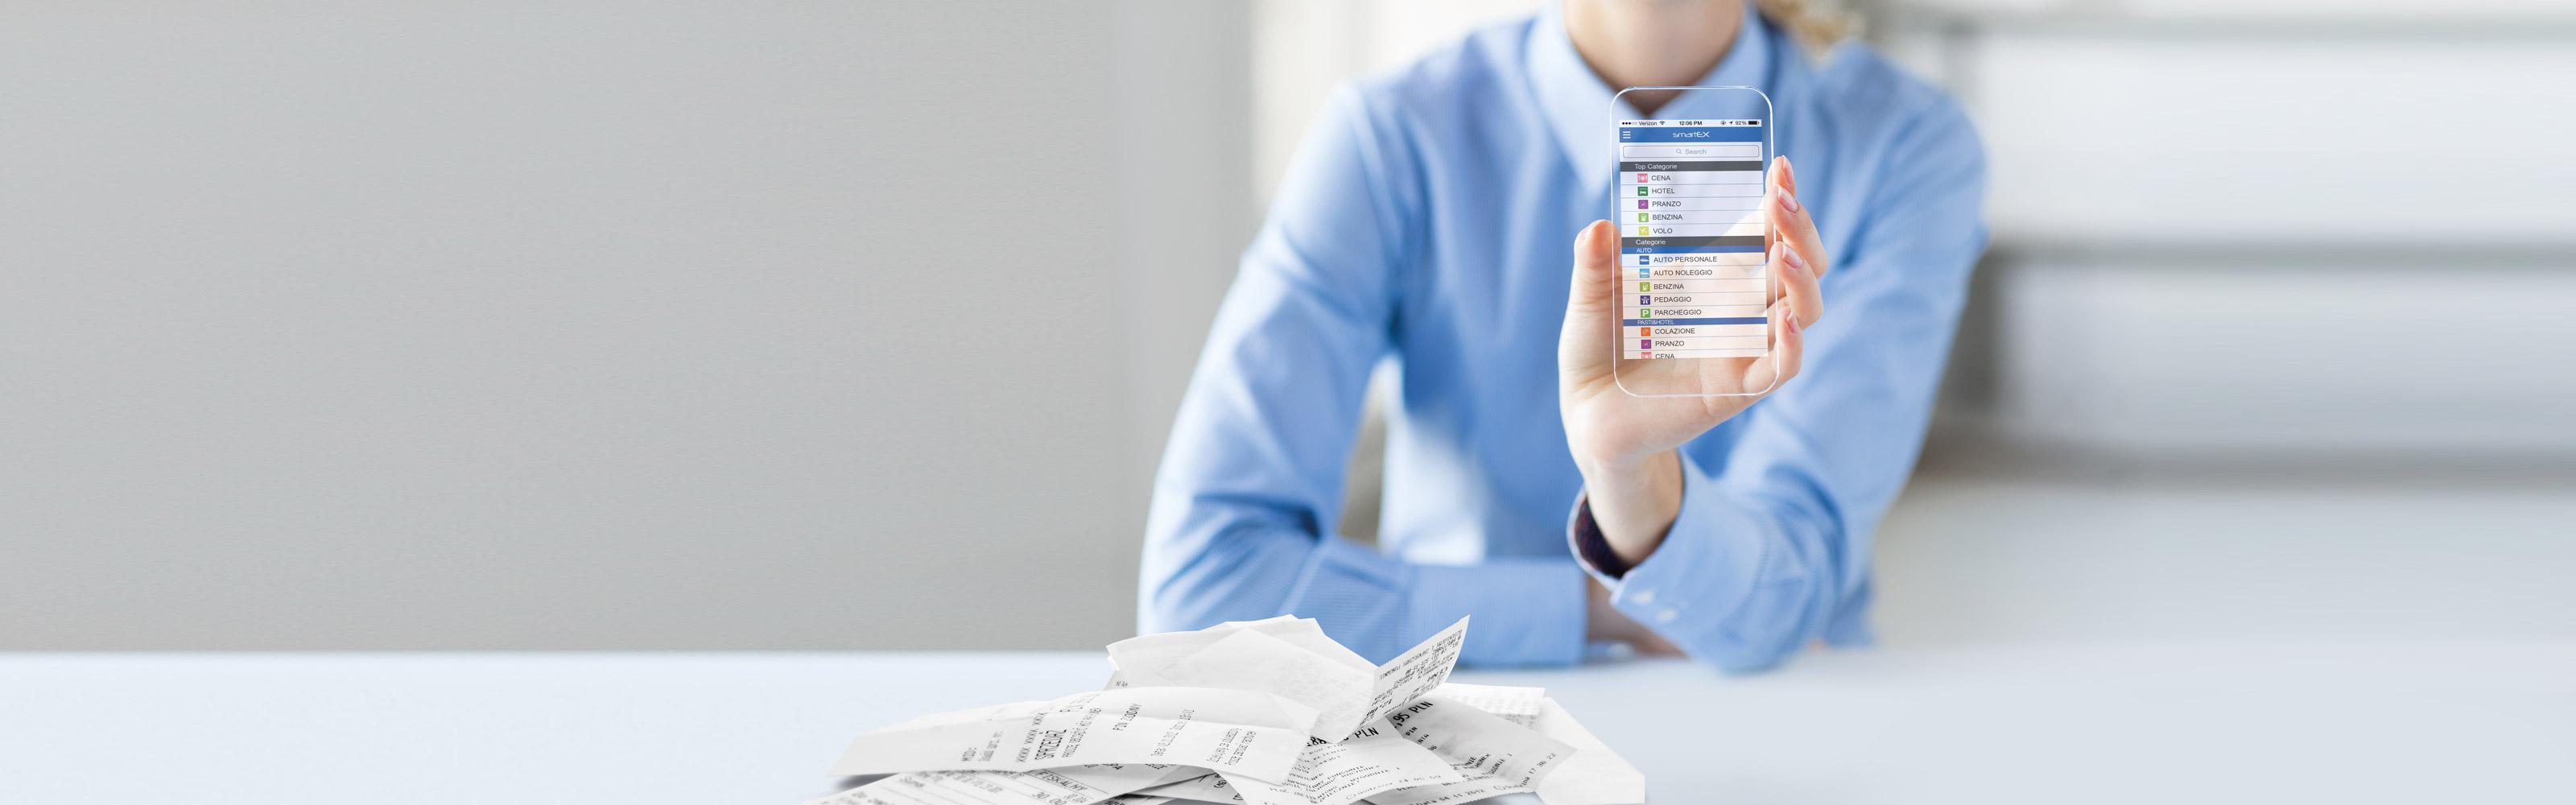 App SmartEX Gestione Spese